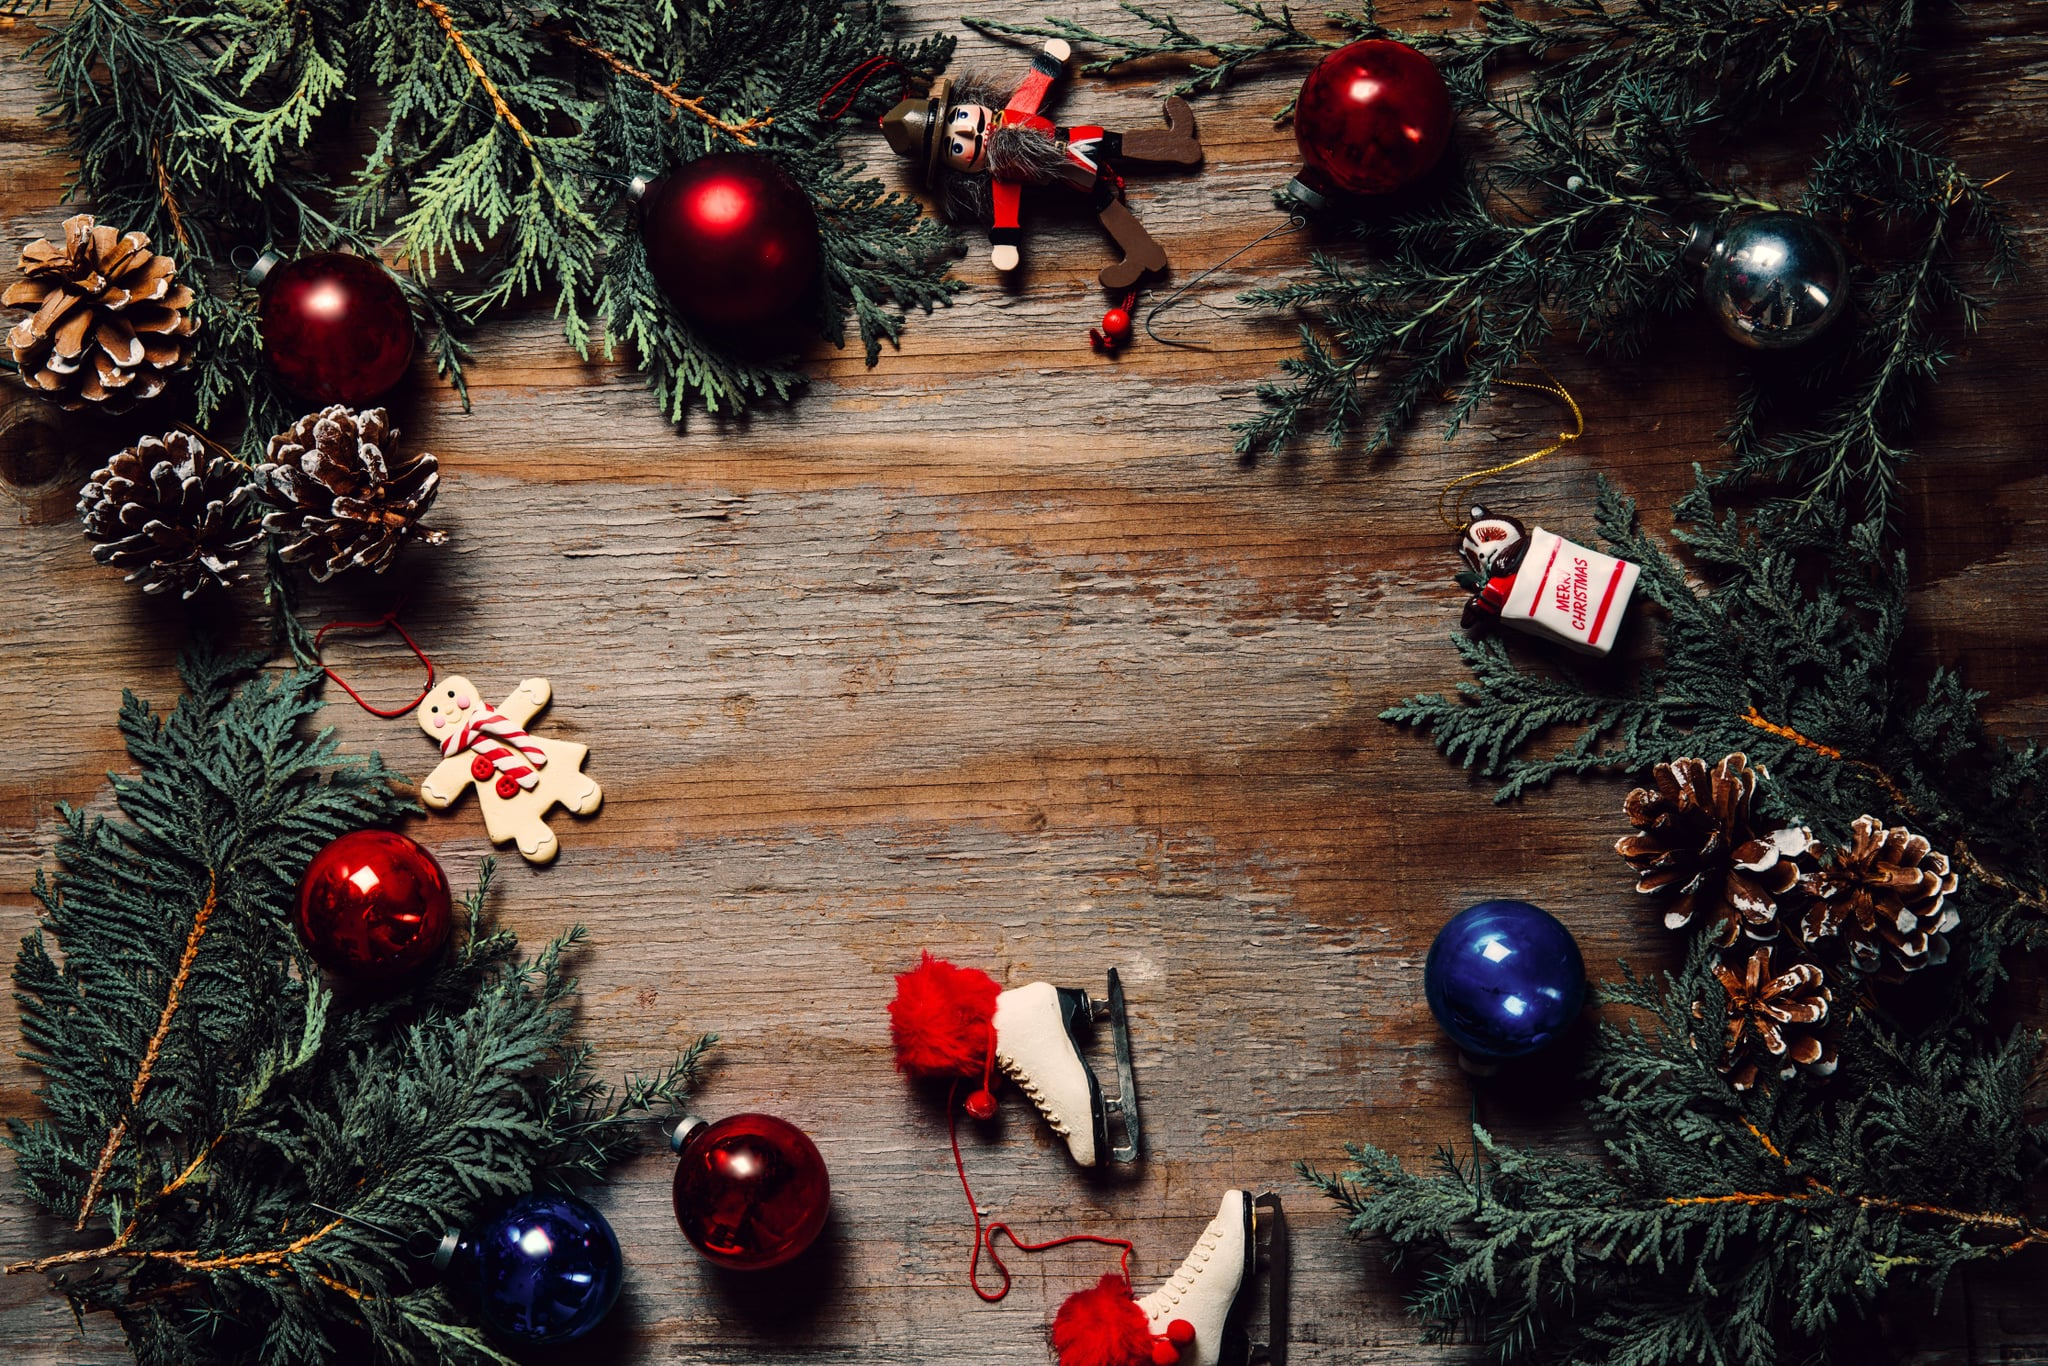 tmp_Nx4Z8g_1d67612335adfa44_woodgrain-with-christmas-ornaments.jpg